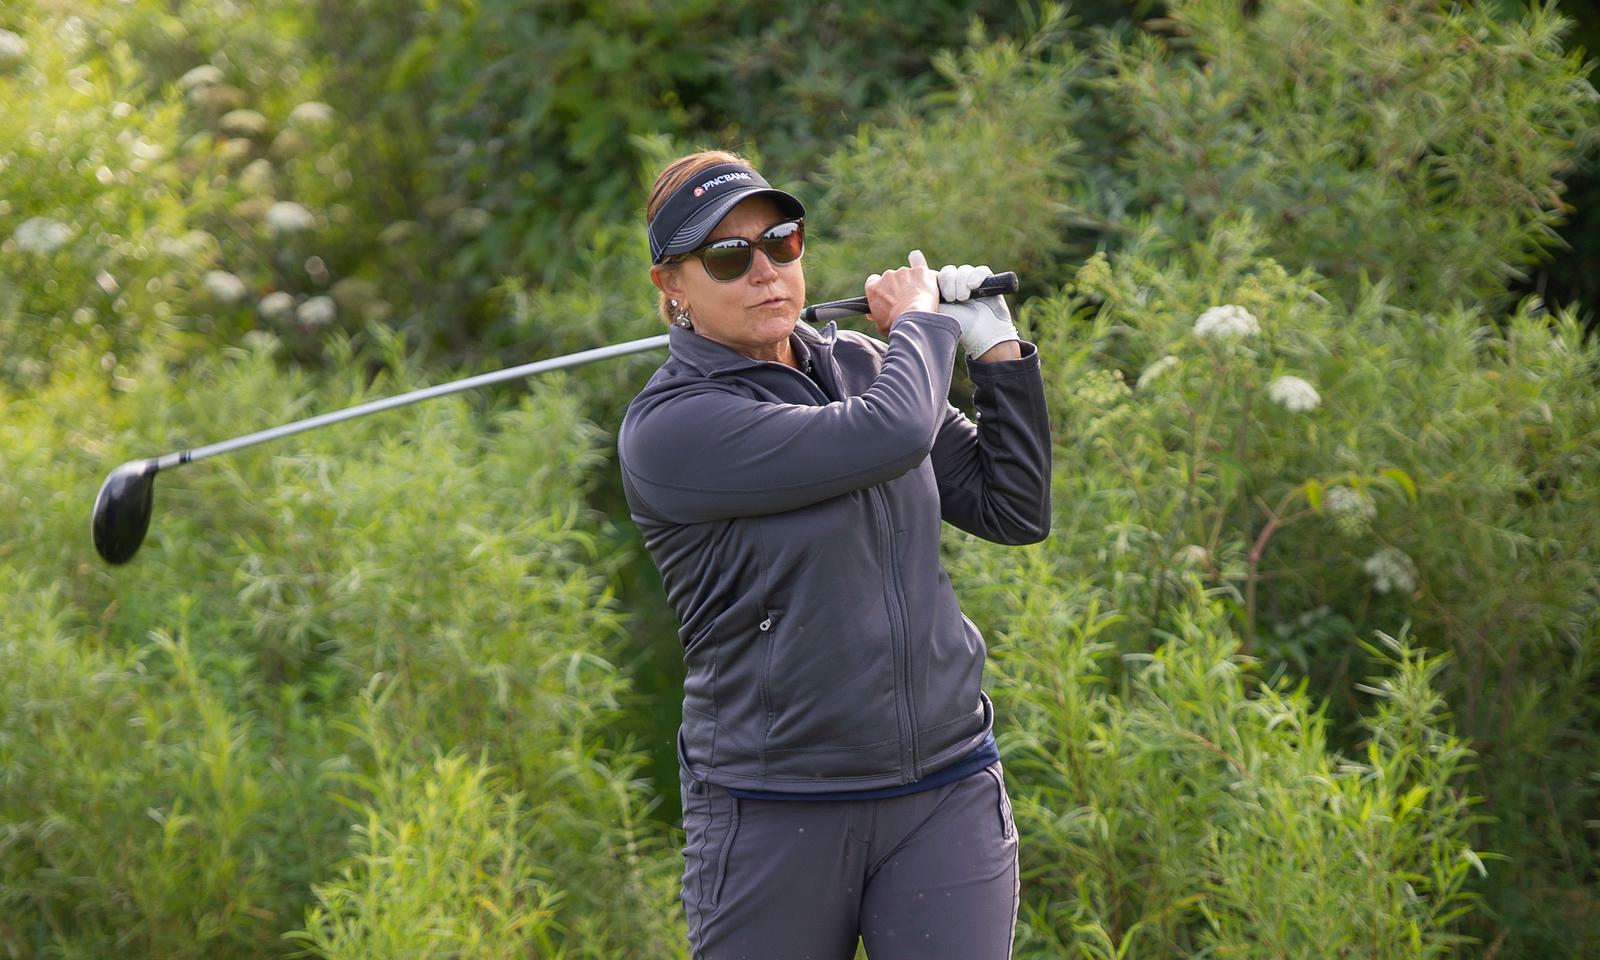 2020_golf_outing_ND40456.jpg